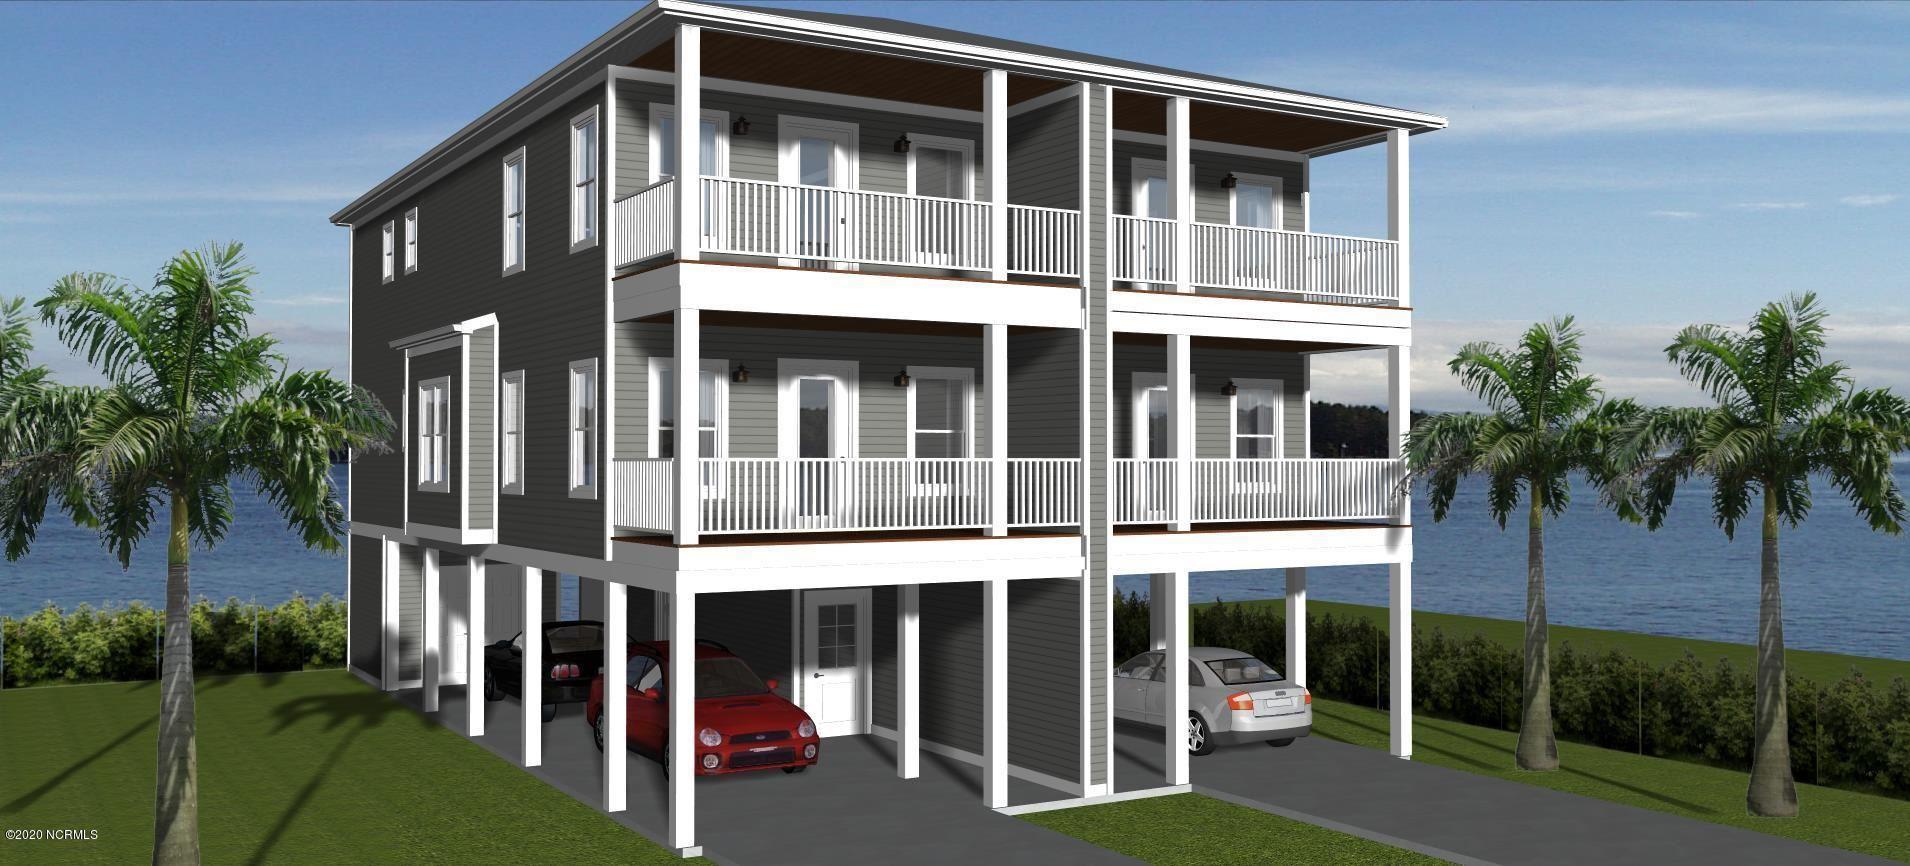 Photo of 1309 Mackerel Lane #2, Carolina Beach, NC 28428 (MLS # 100260049)